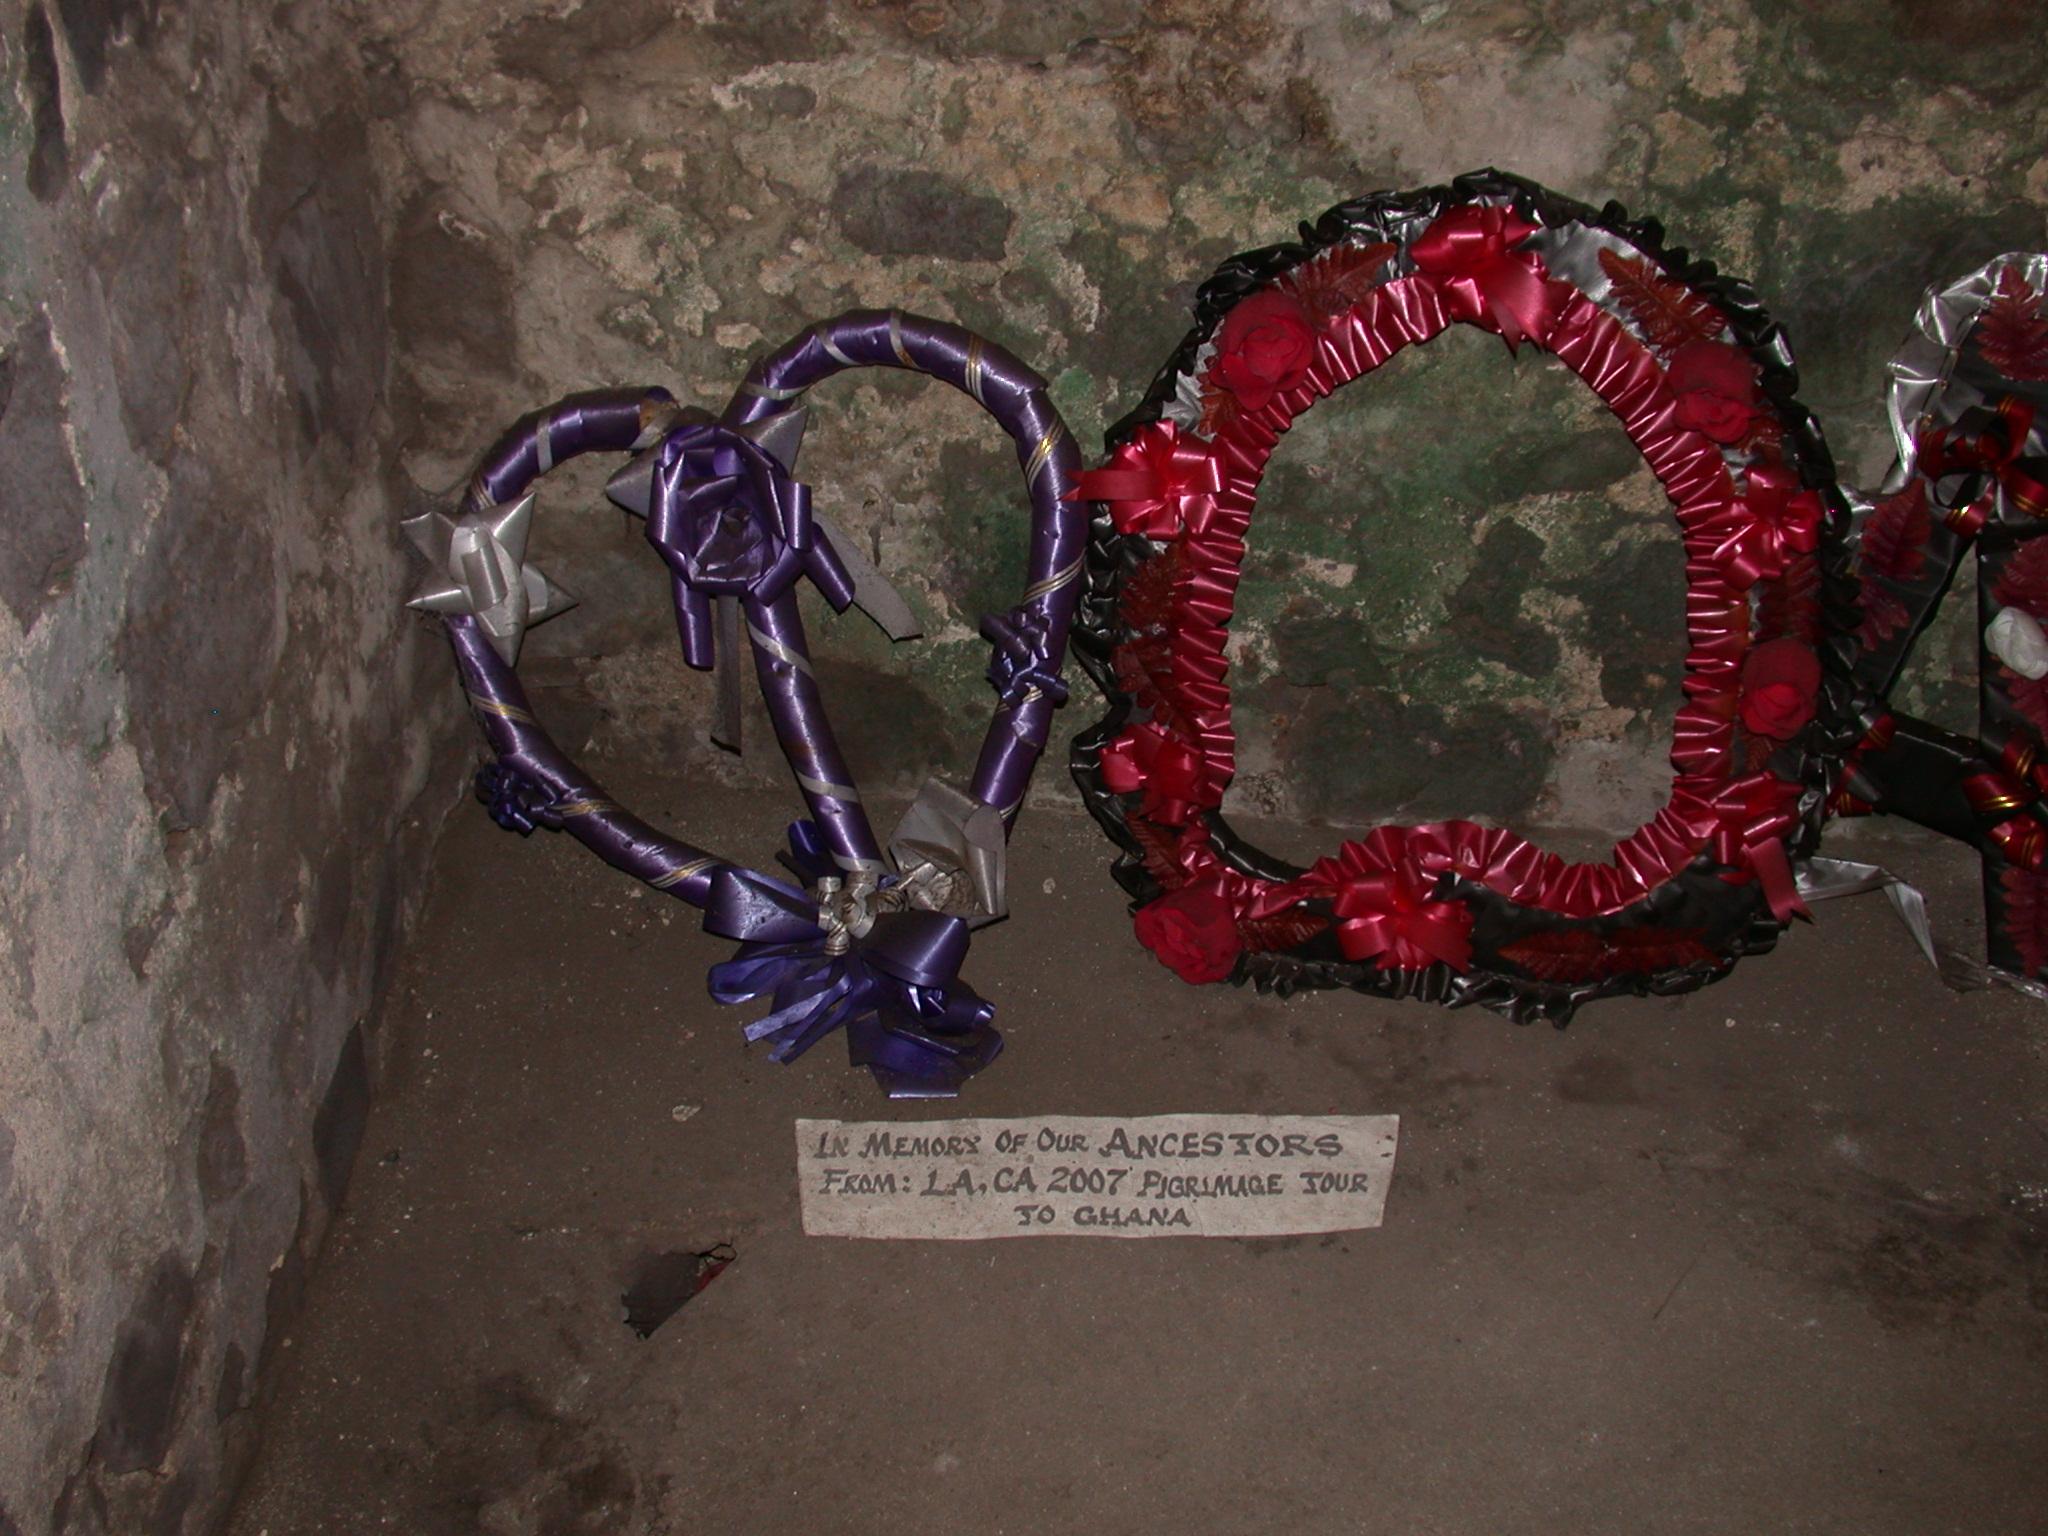 Wreaths Laid in Memory of Slaves, Passage From Slave Cells, Elmina Slave Fort, Elmina, Ghana